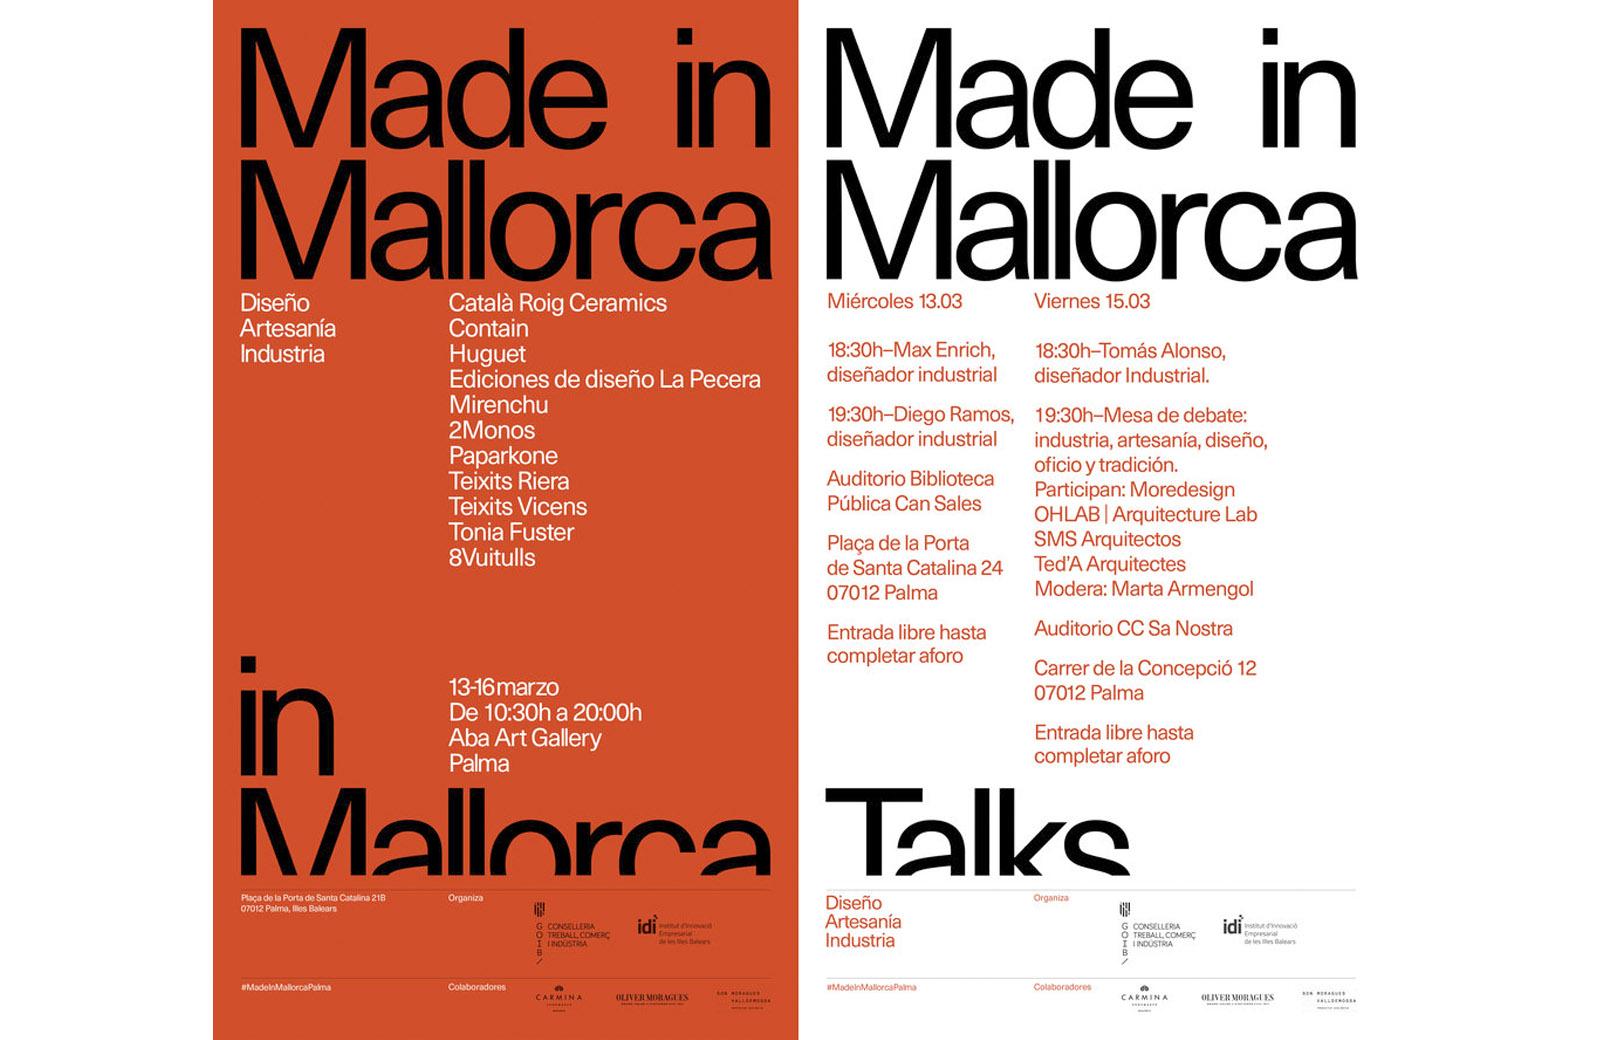 made-in-mallorca_ohlab_01